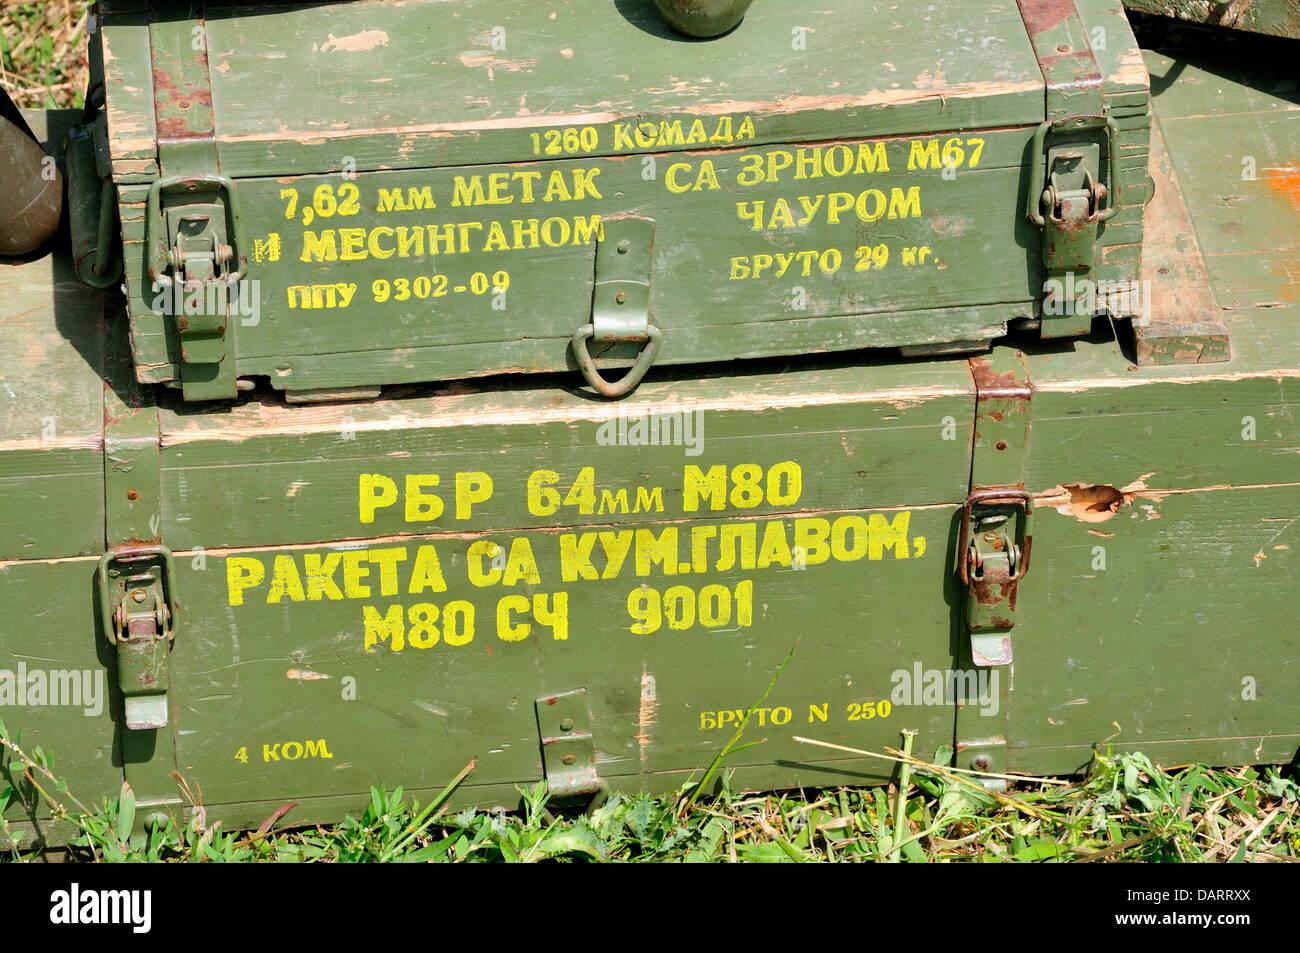 Yugoslav / Serbian ammunition cases. War and Peace Revival, July 2013. Folkestone Racecourse, Kent, England, UK. - Stock Image